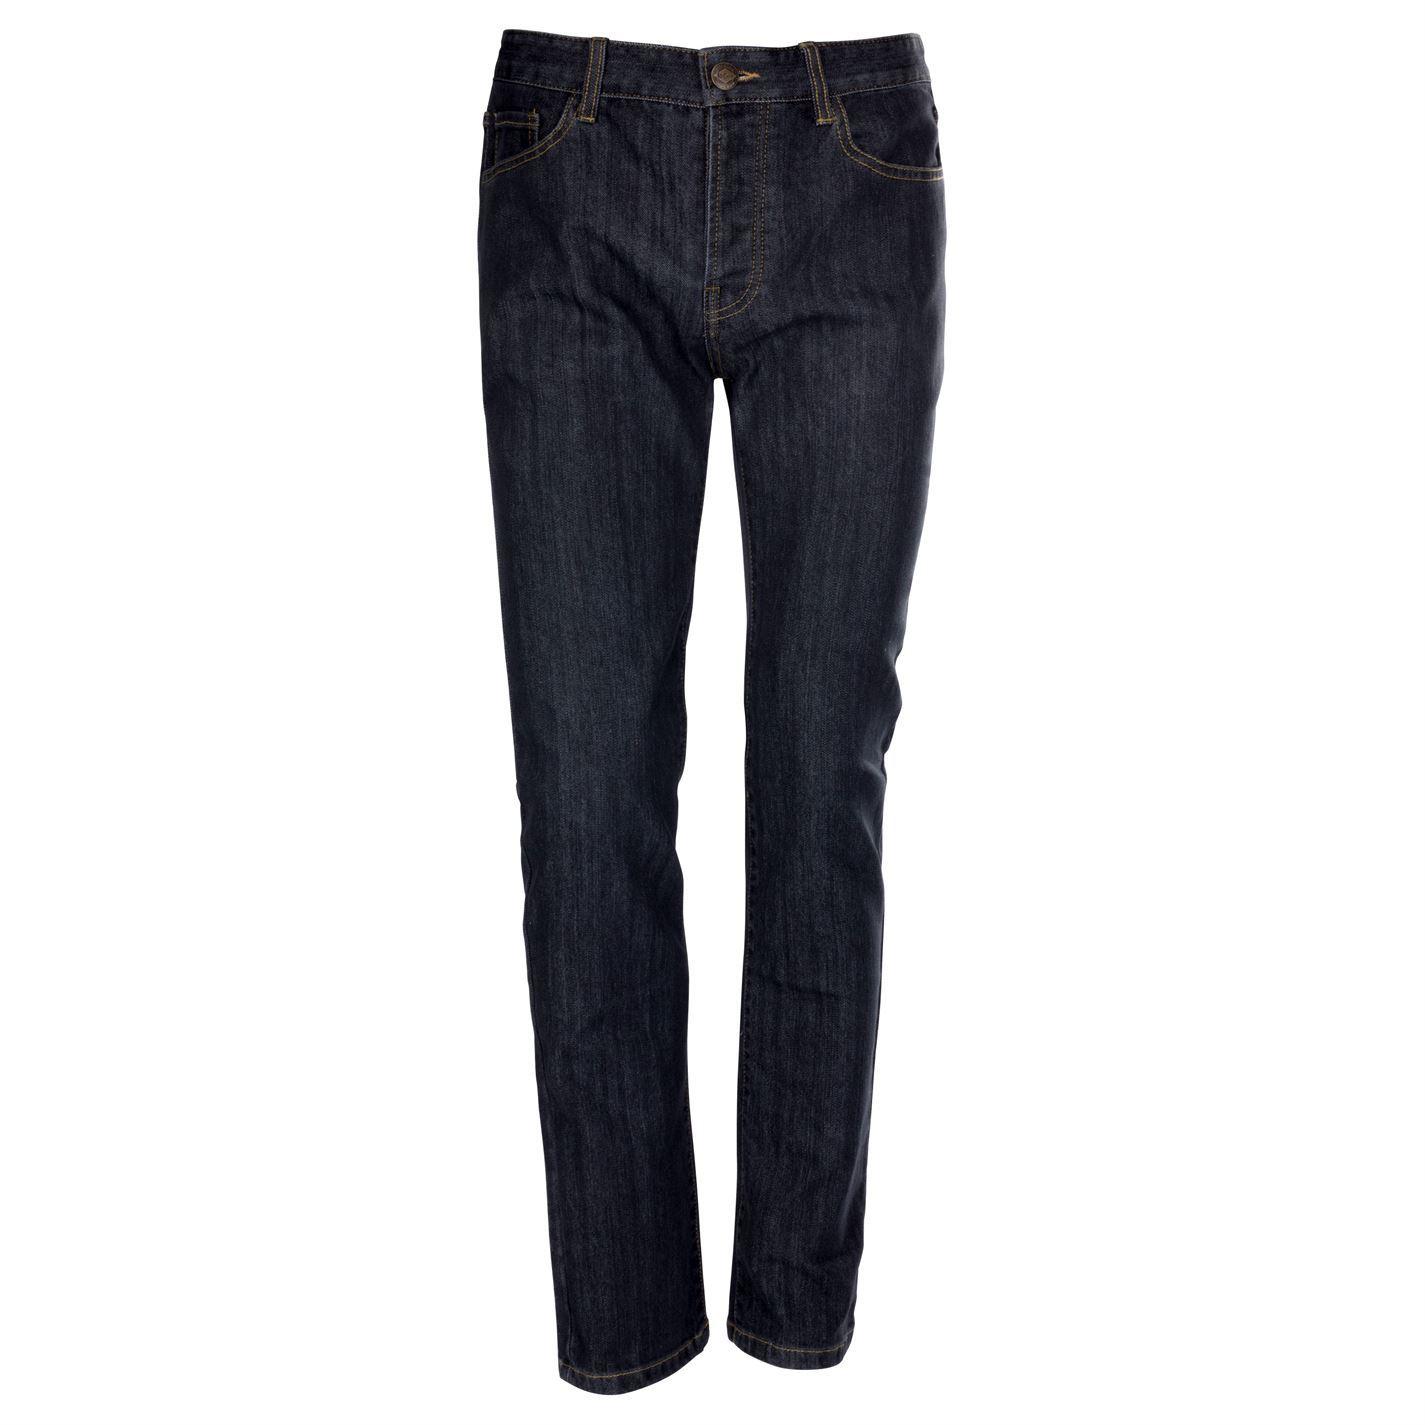 LEE-COOPER-homme-REGULAR-Delave-Jeans-Coupe-Droite-